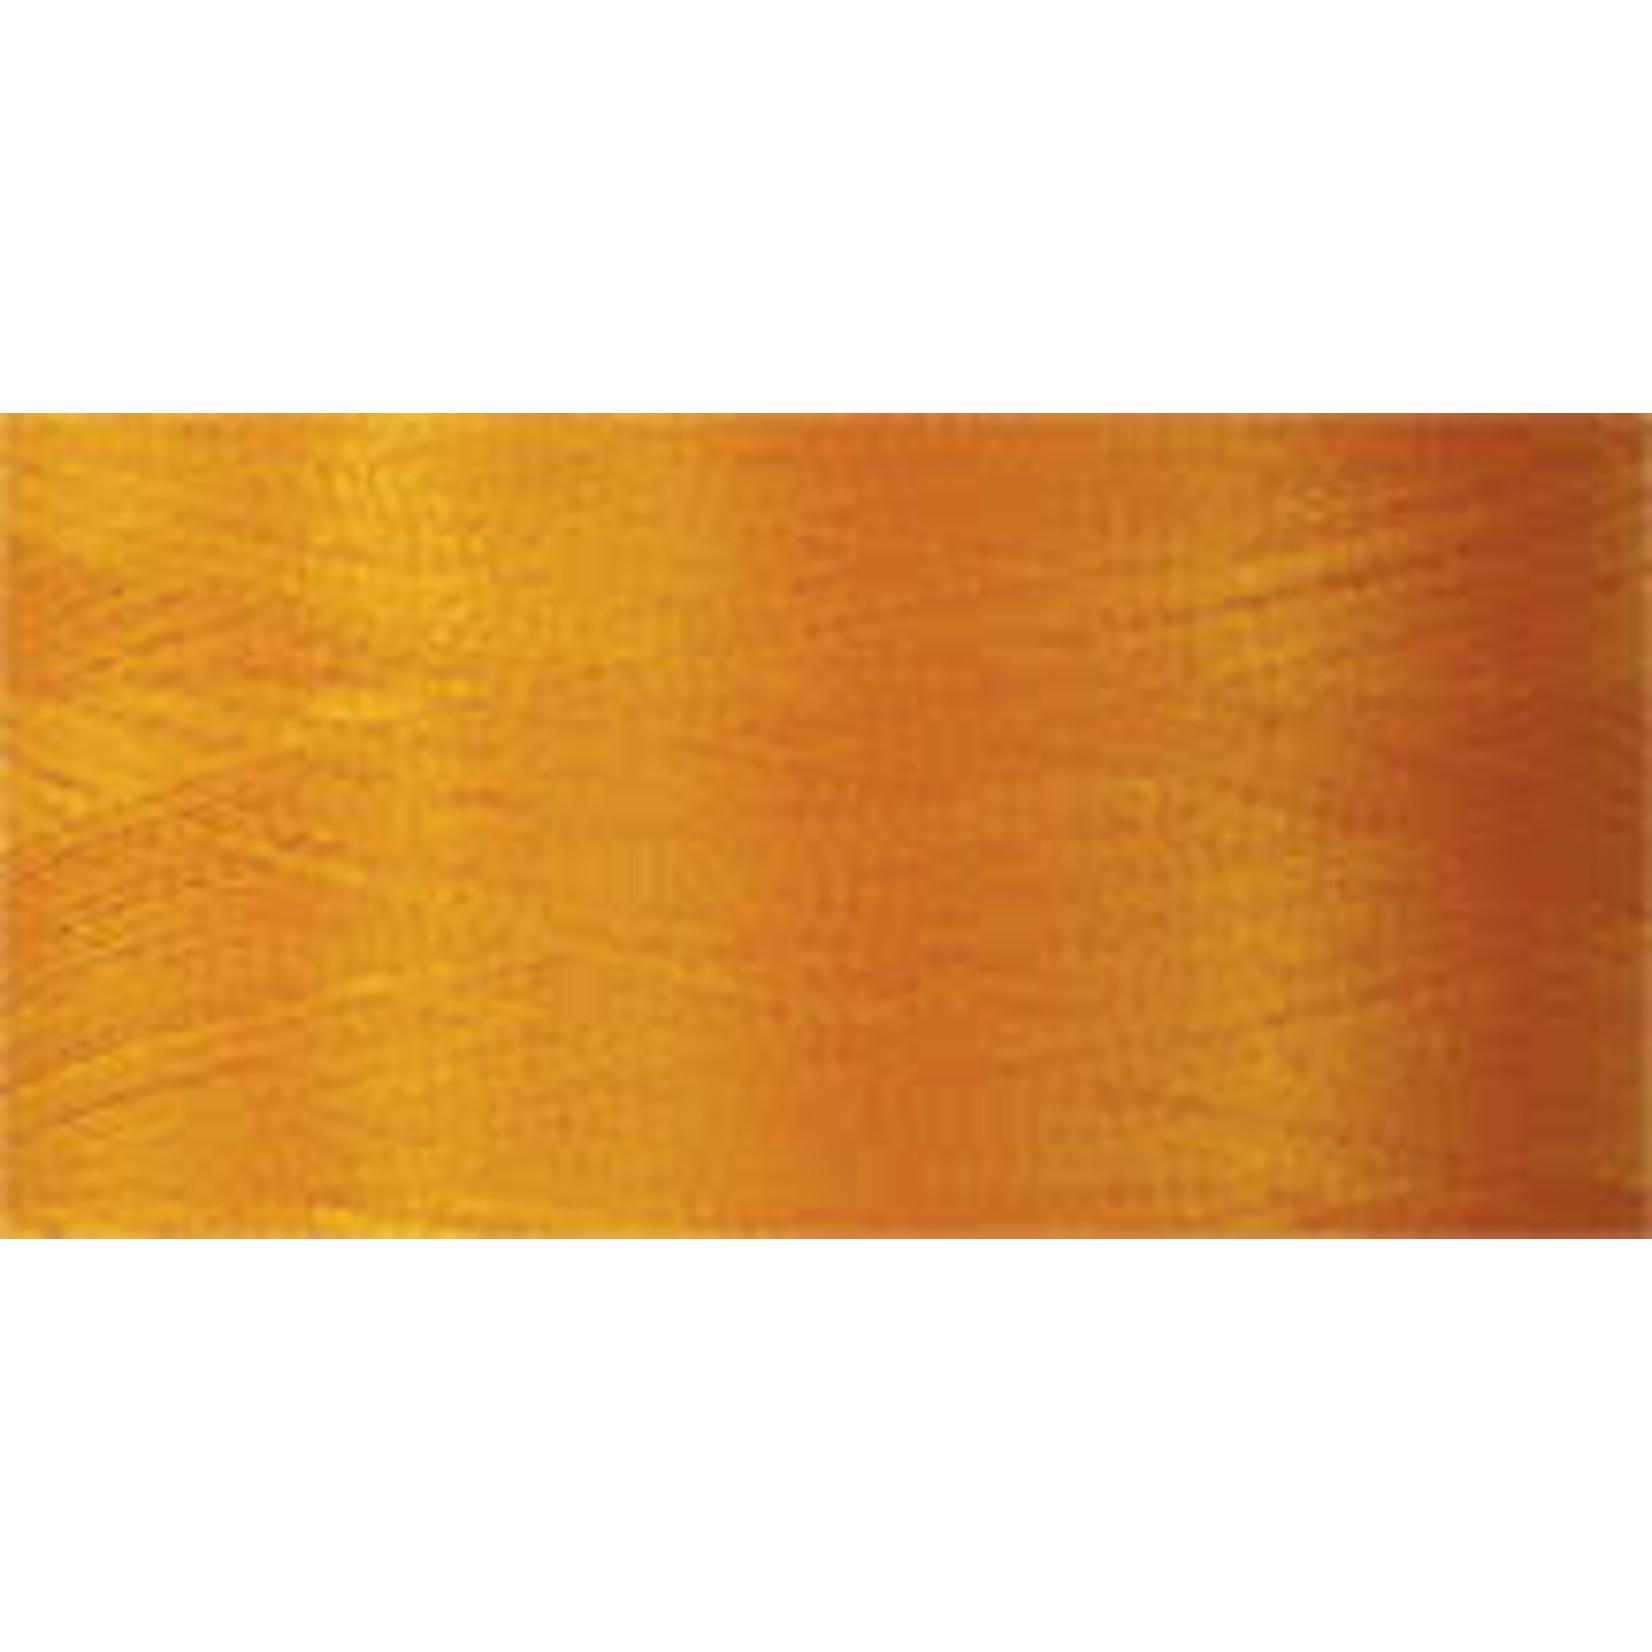 Superior Threads Bottom Line - #60 - 1300 m - 642 Amber